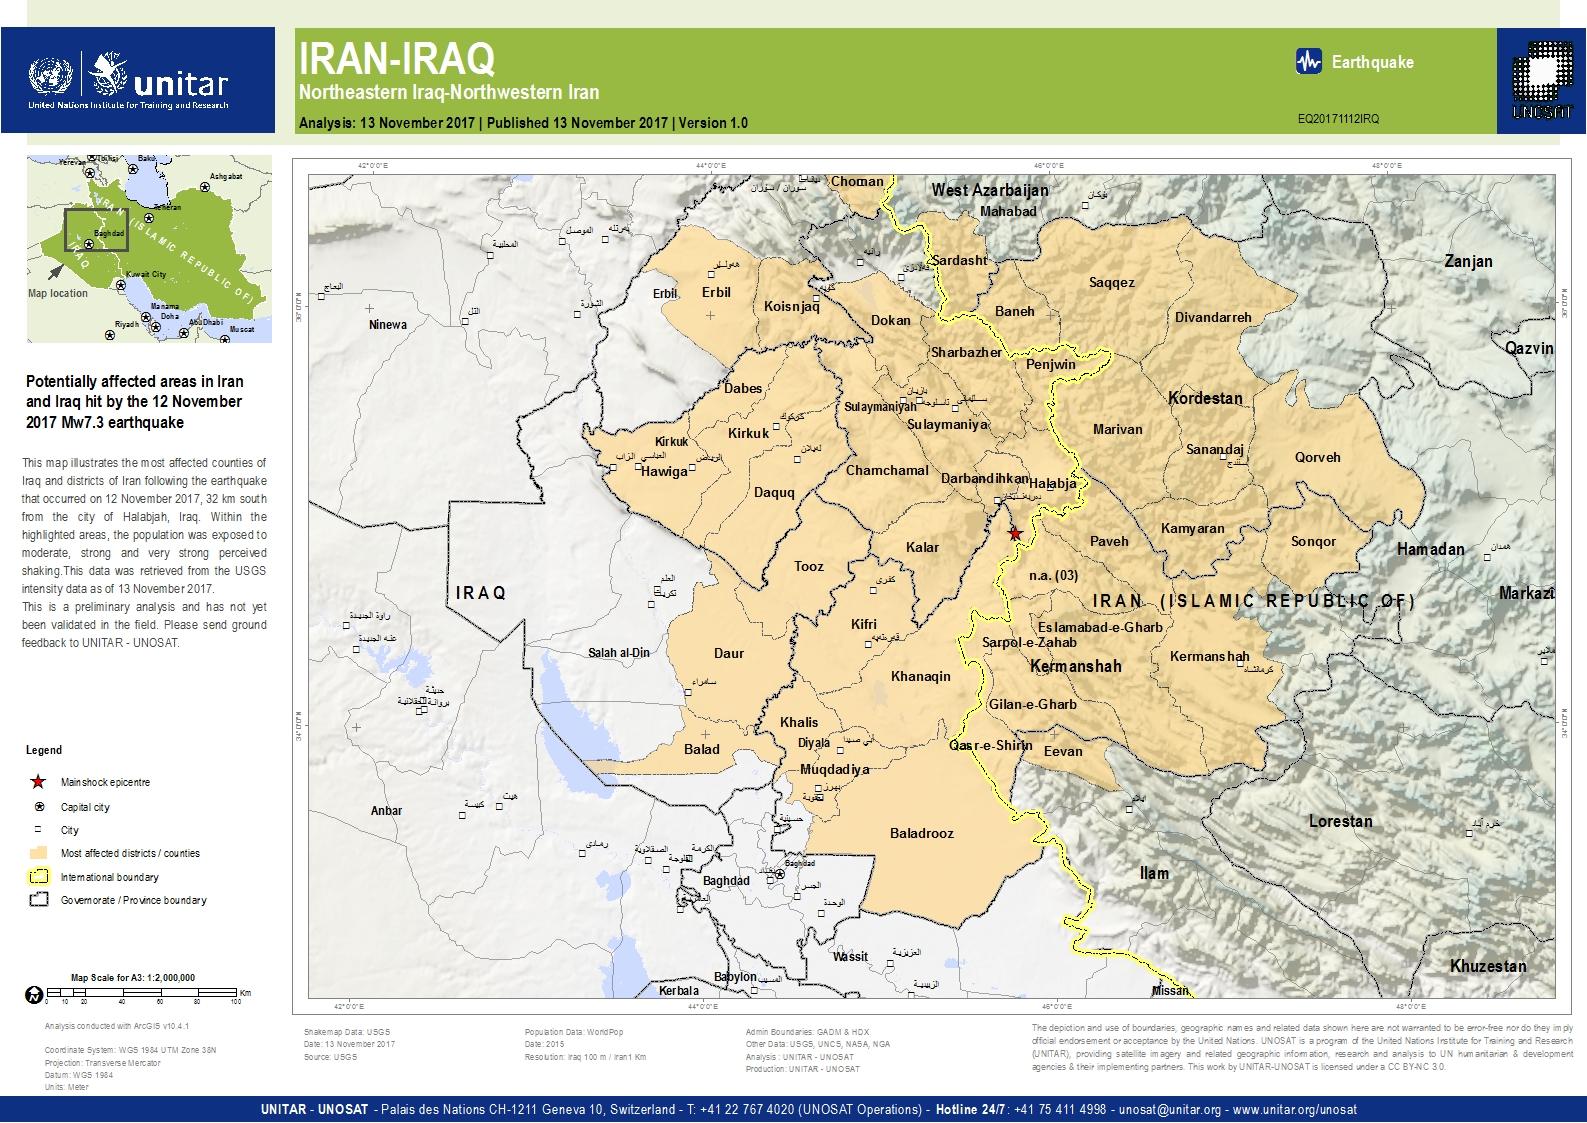 Halabjah earthquake m 73 iraniraq of 12 november 2017 population halabjah earthquake m 73 iraniraq of 12 november 2017 population exposure analysis unitar gumiabroncs Image collections